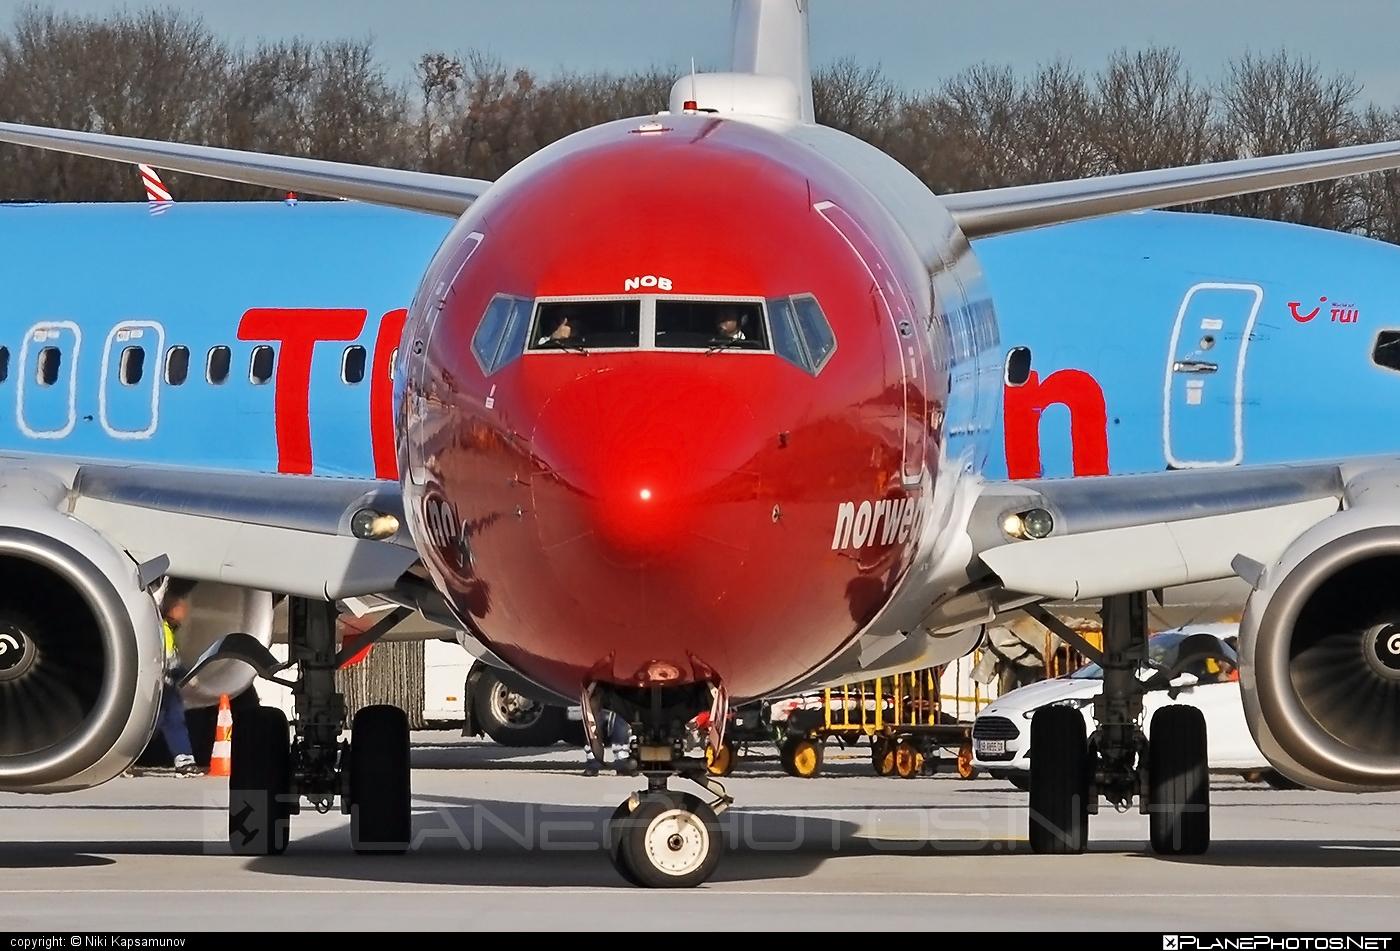 Boeing 737-800 - LN-NOB operated by Norwegian Air Shuttle #b737 #b737nextgen #b737ng #boeing #boeing737 #norwegian #norwegianair #norwegianairshuttle